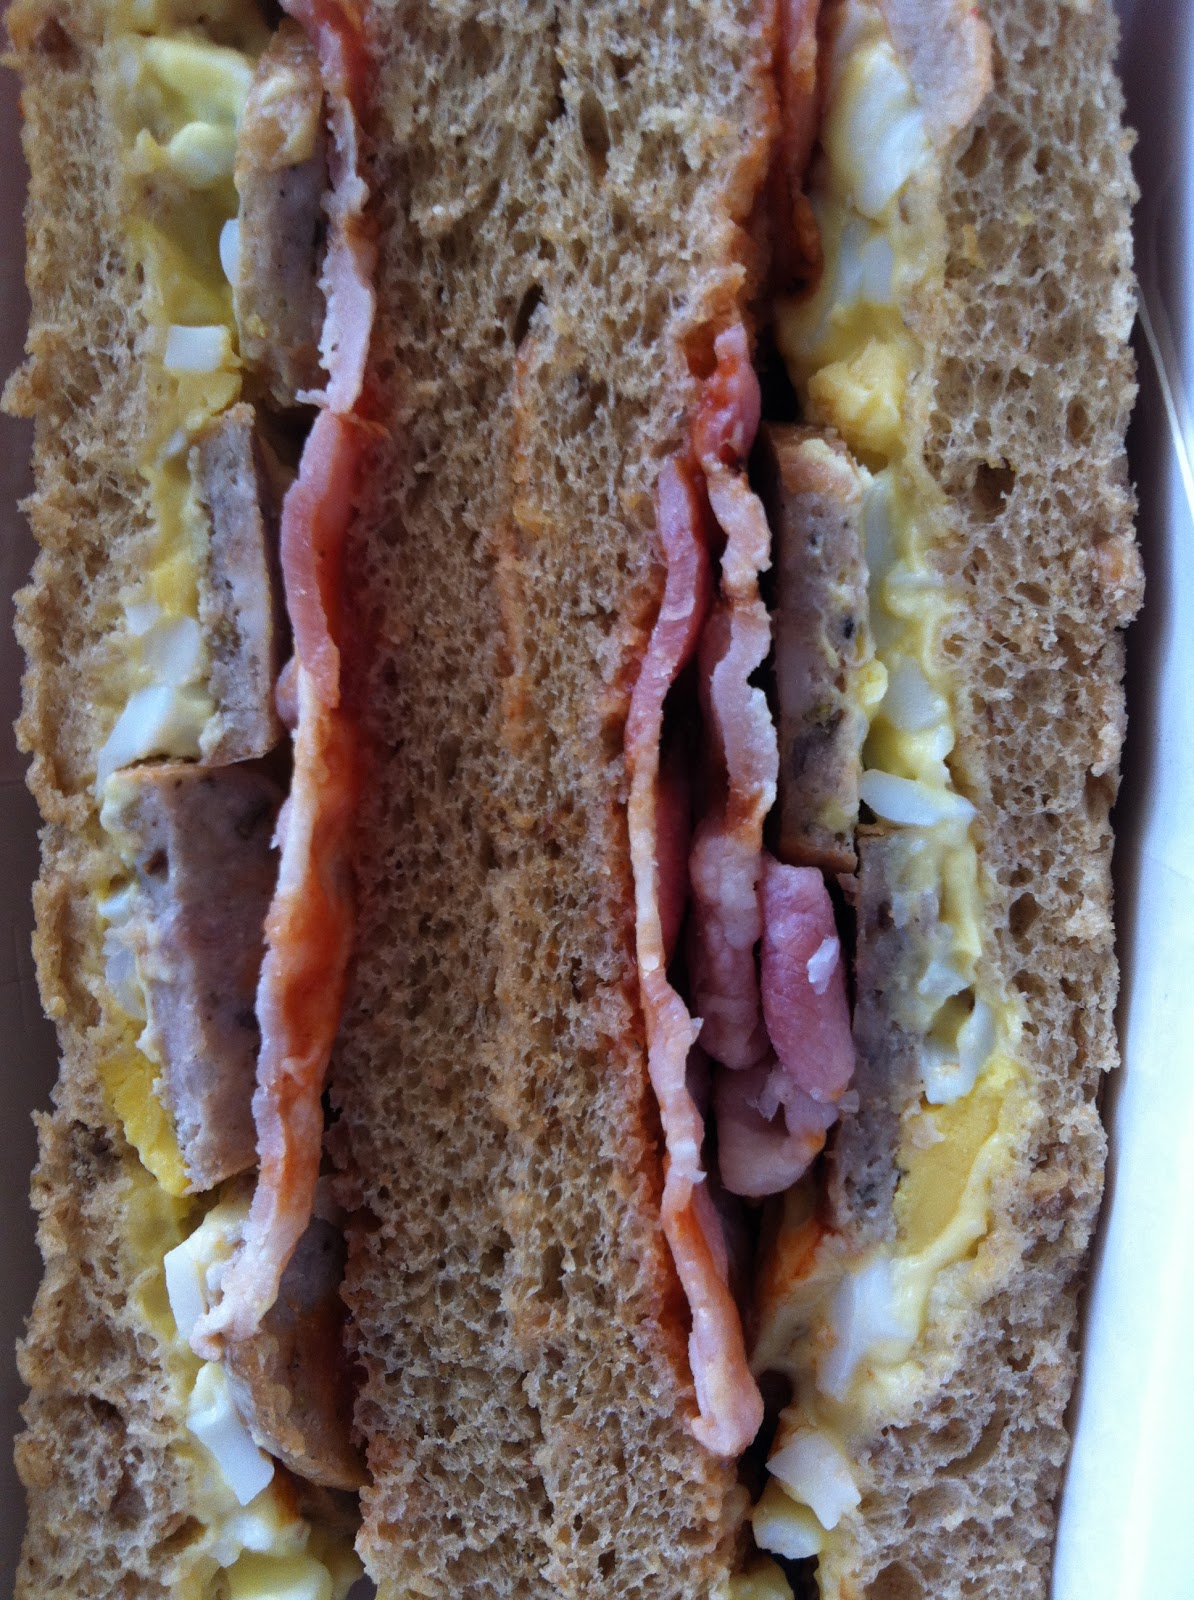 The Fry Up Inspector Tesco All Day Breakfast Sandwich